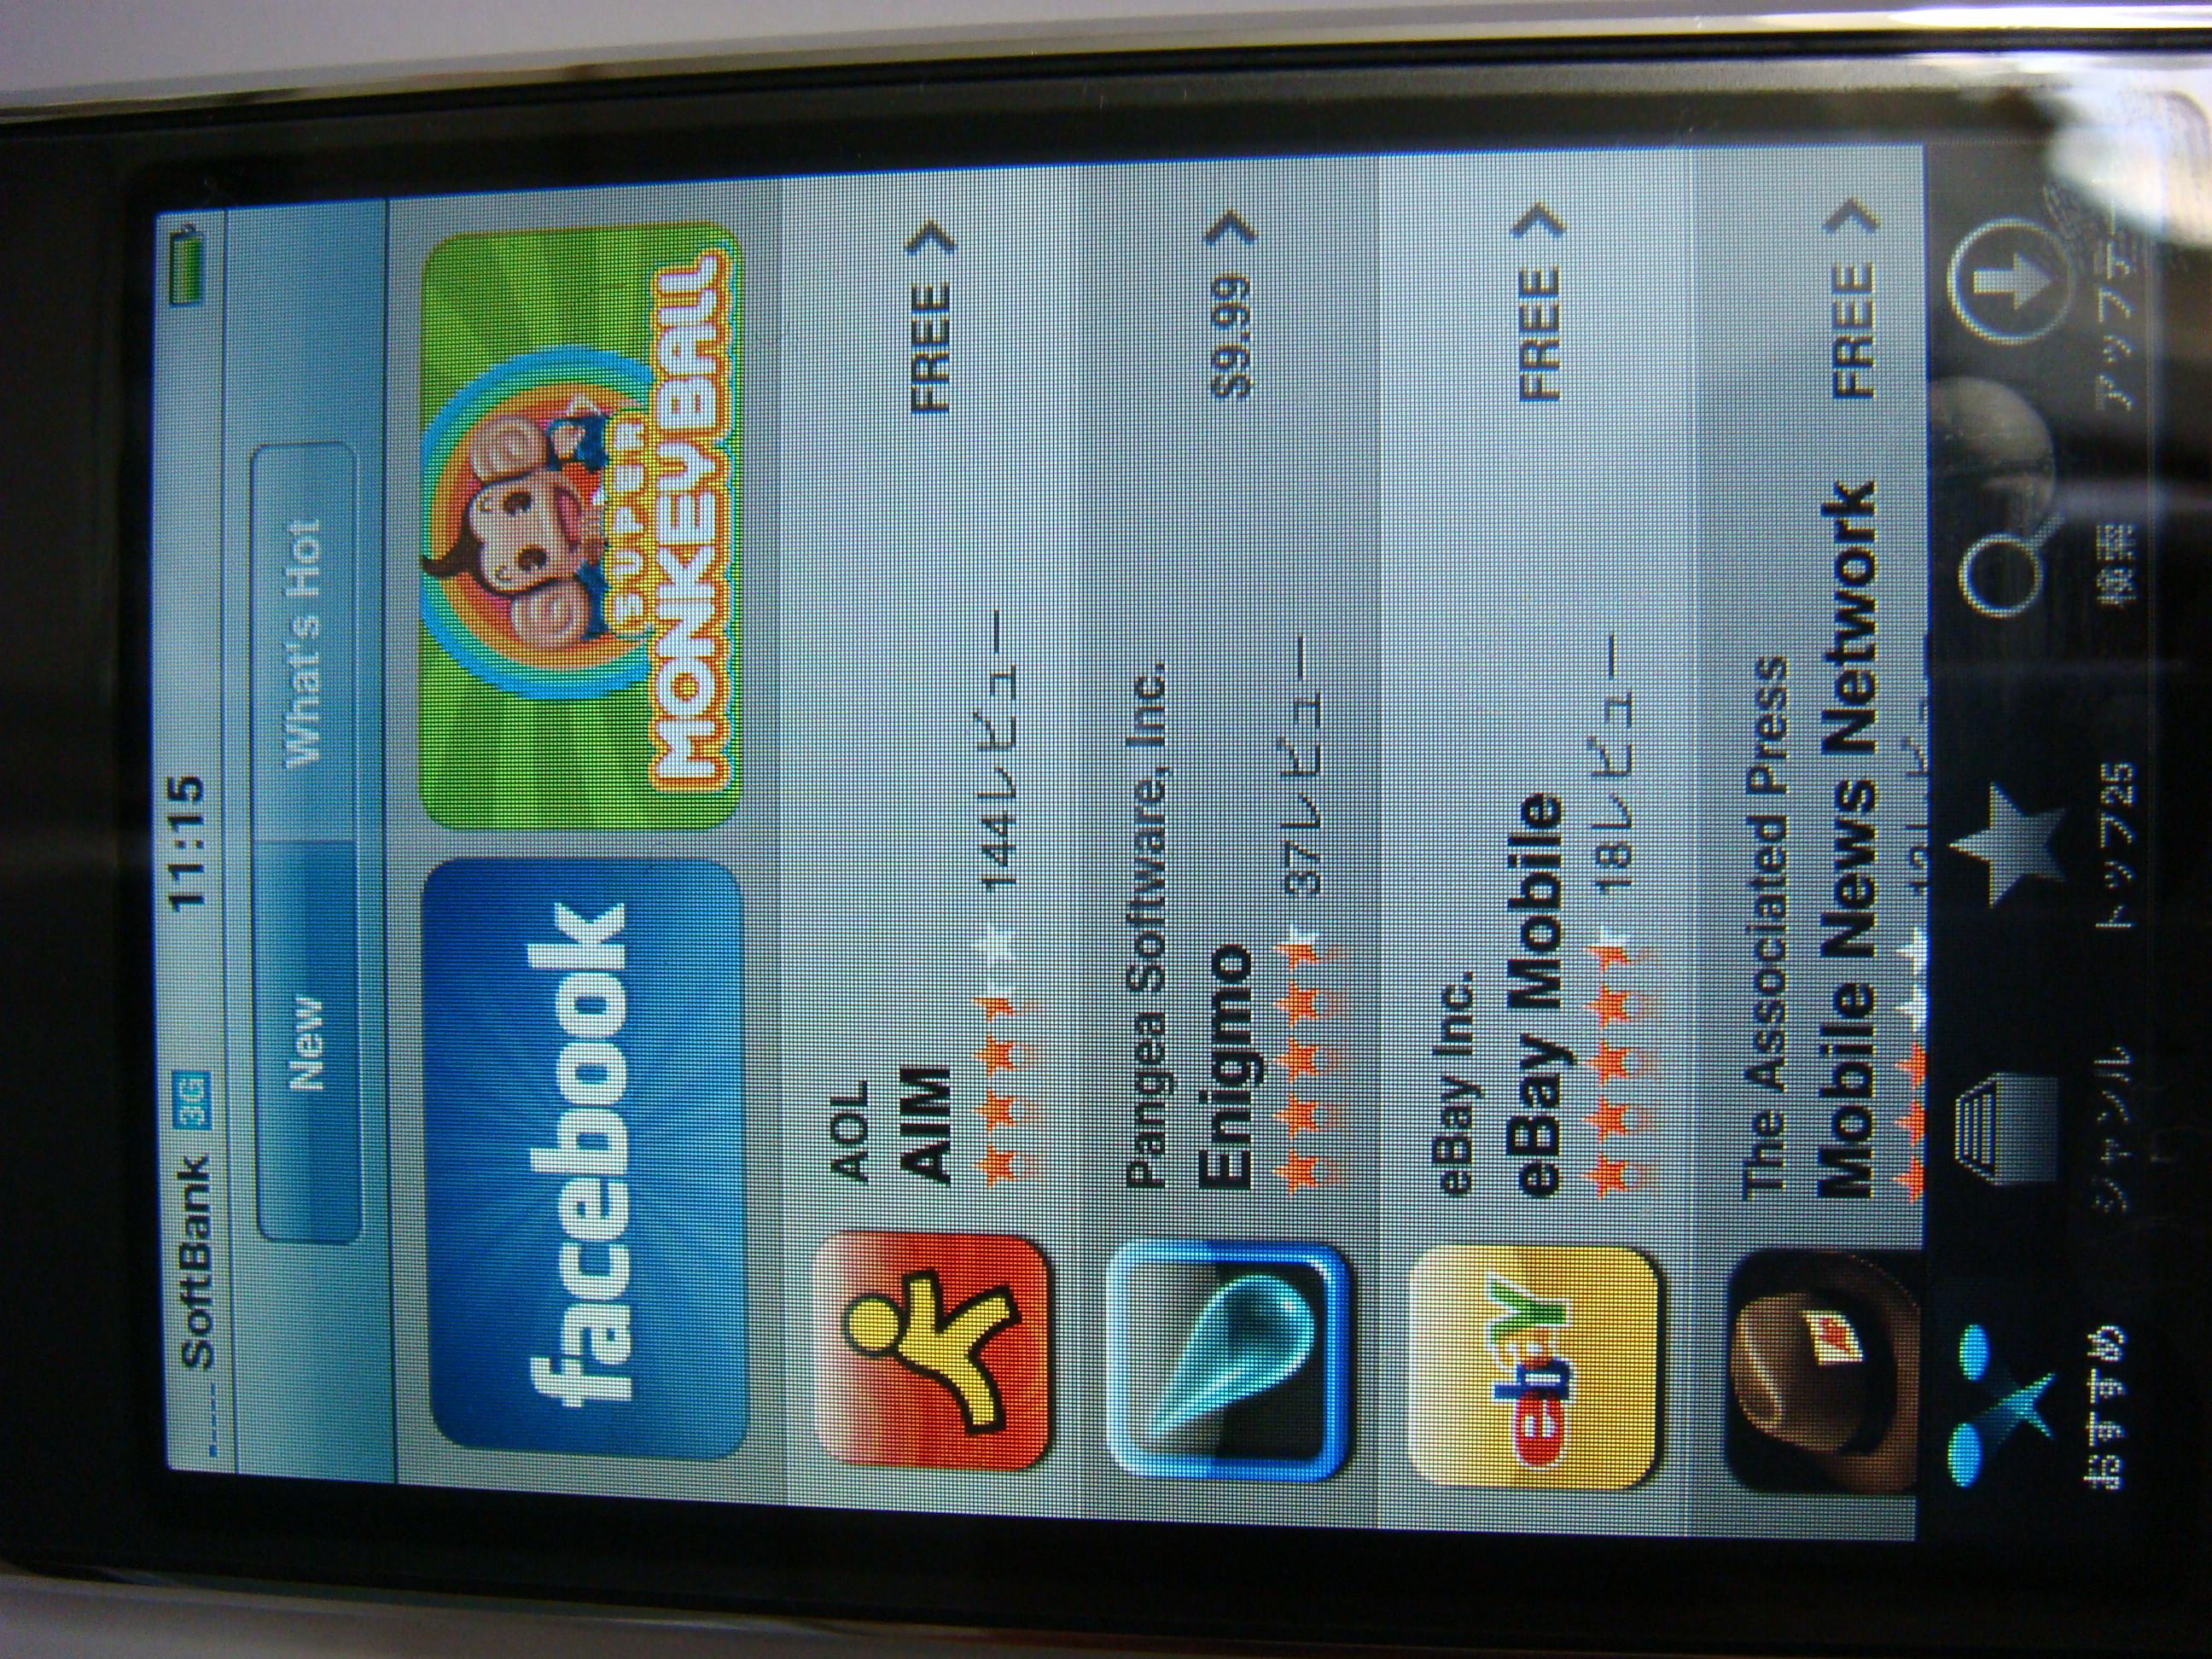 iPhone 3G App Store